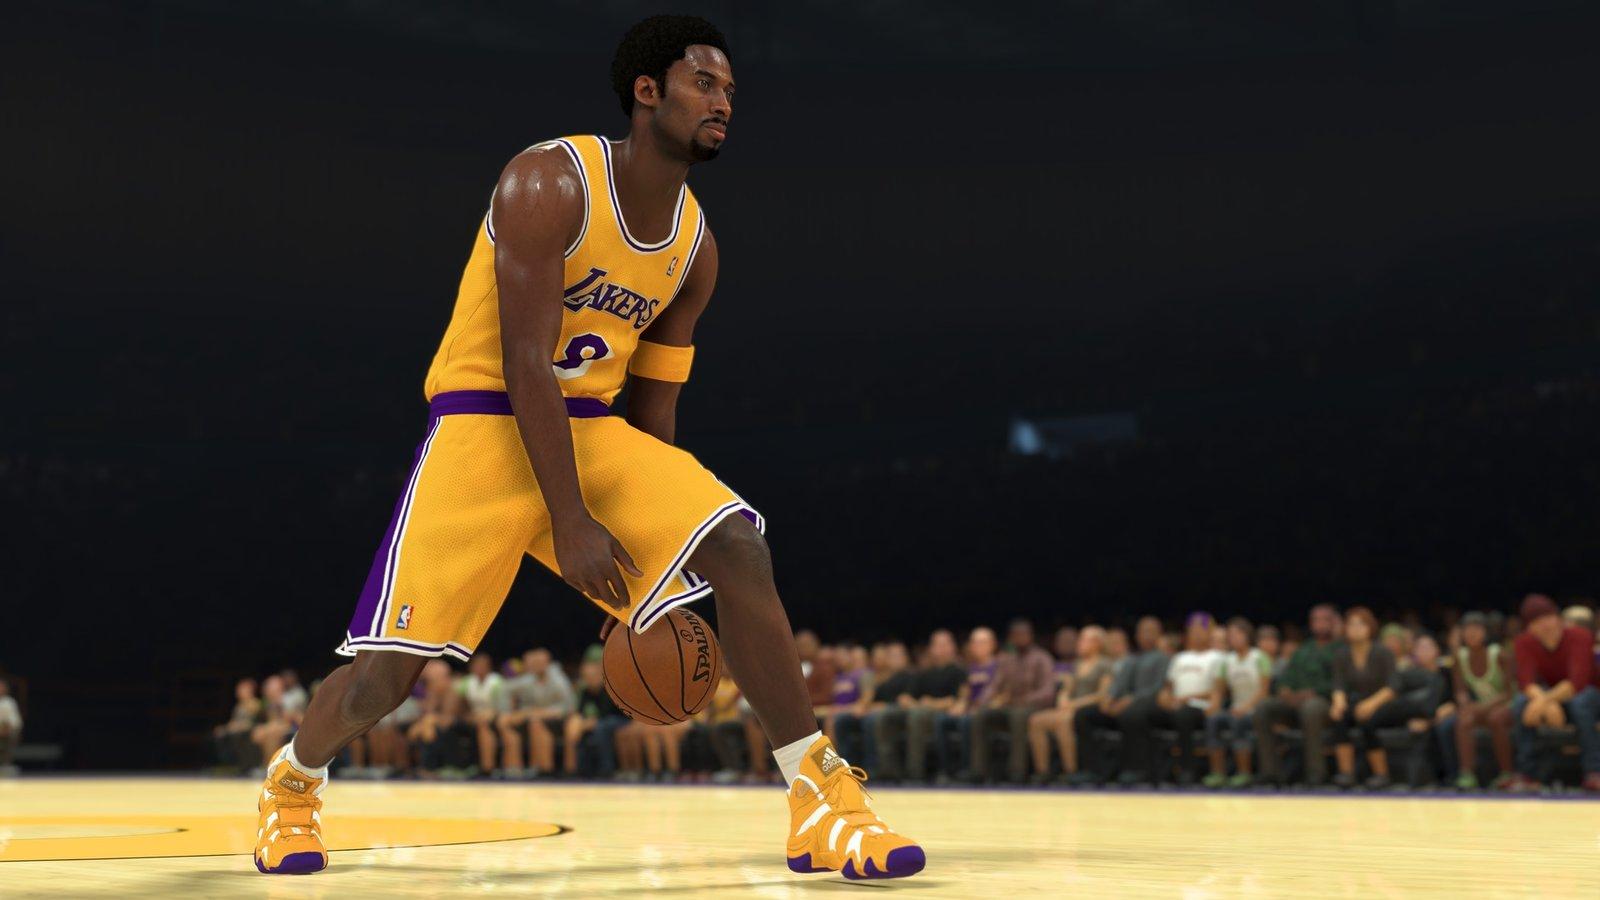 NBA 2K21 image 1